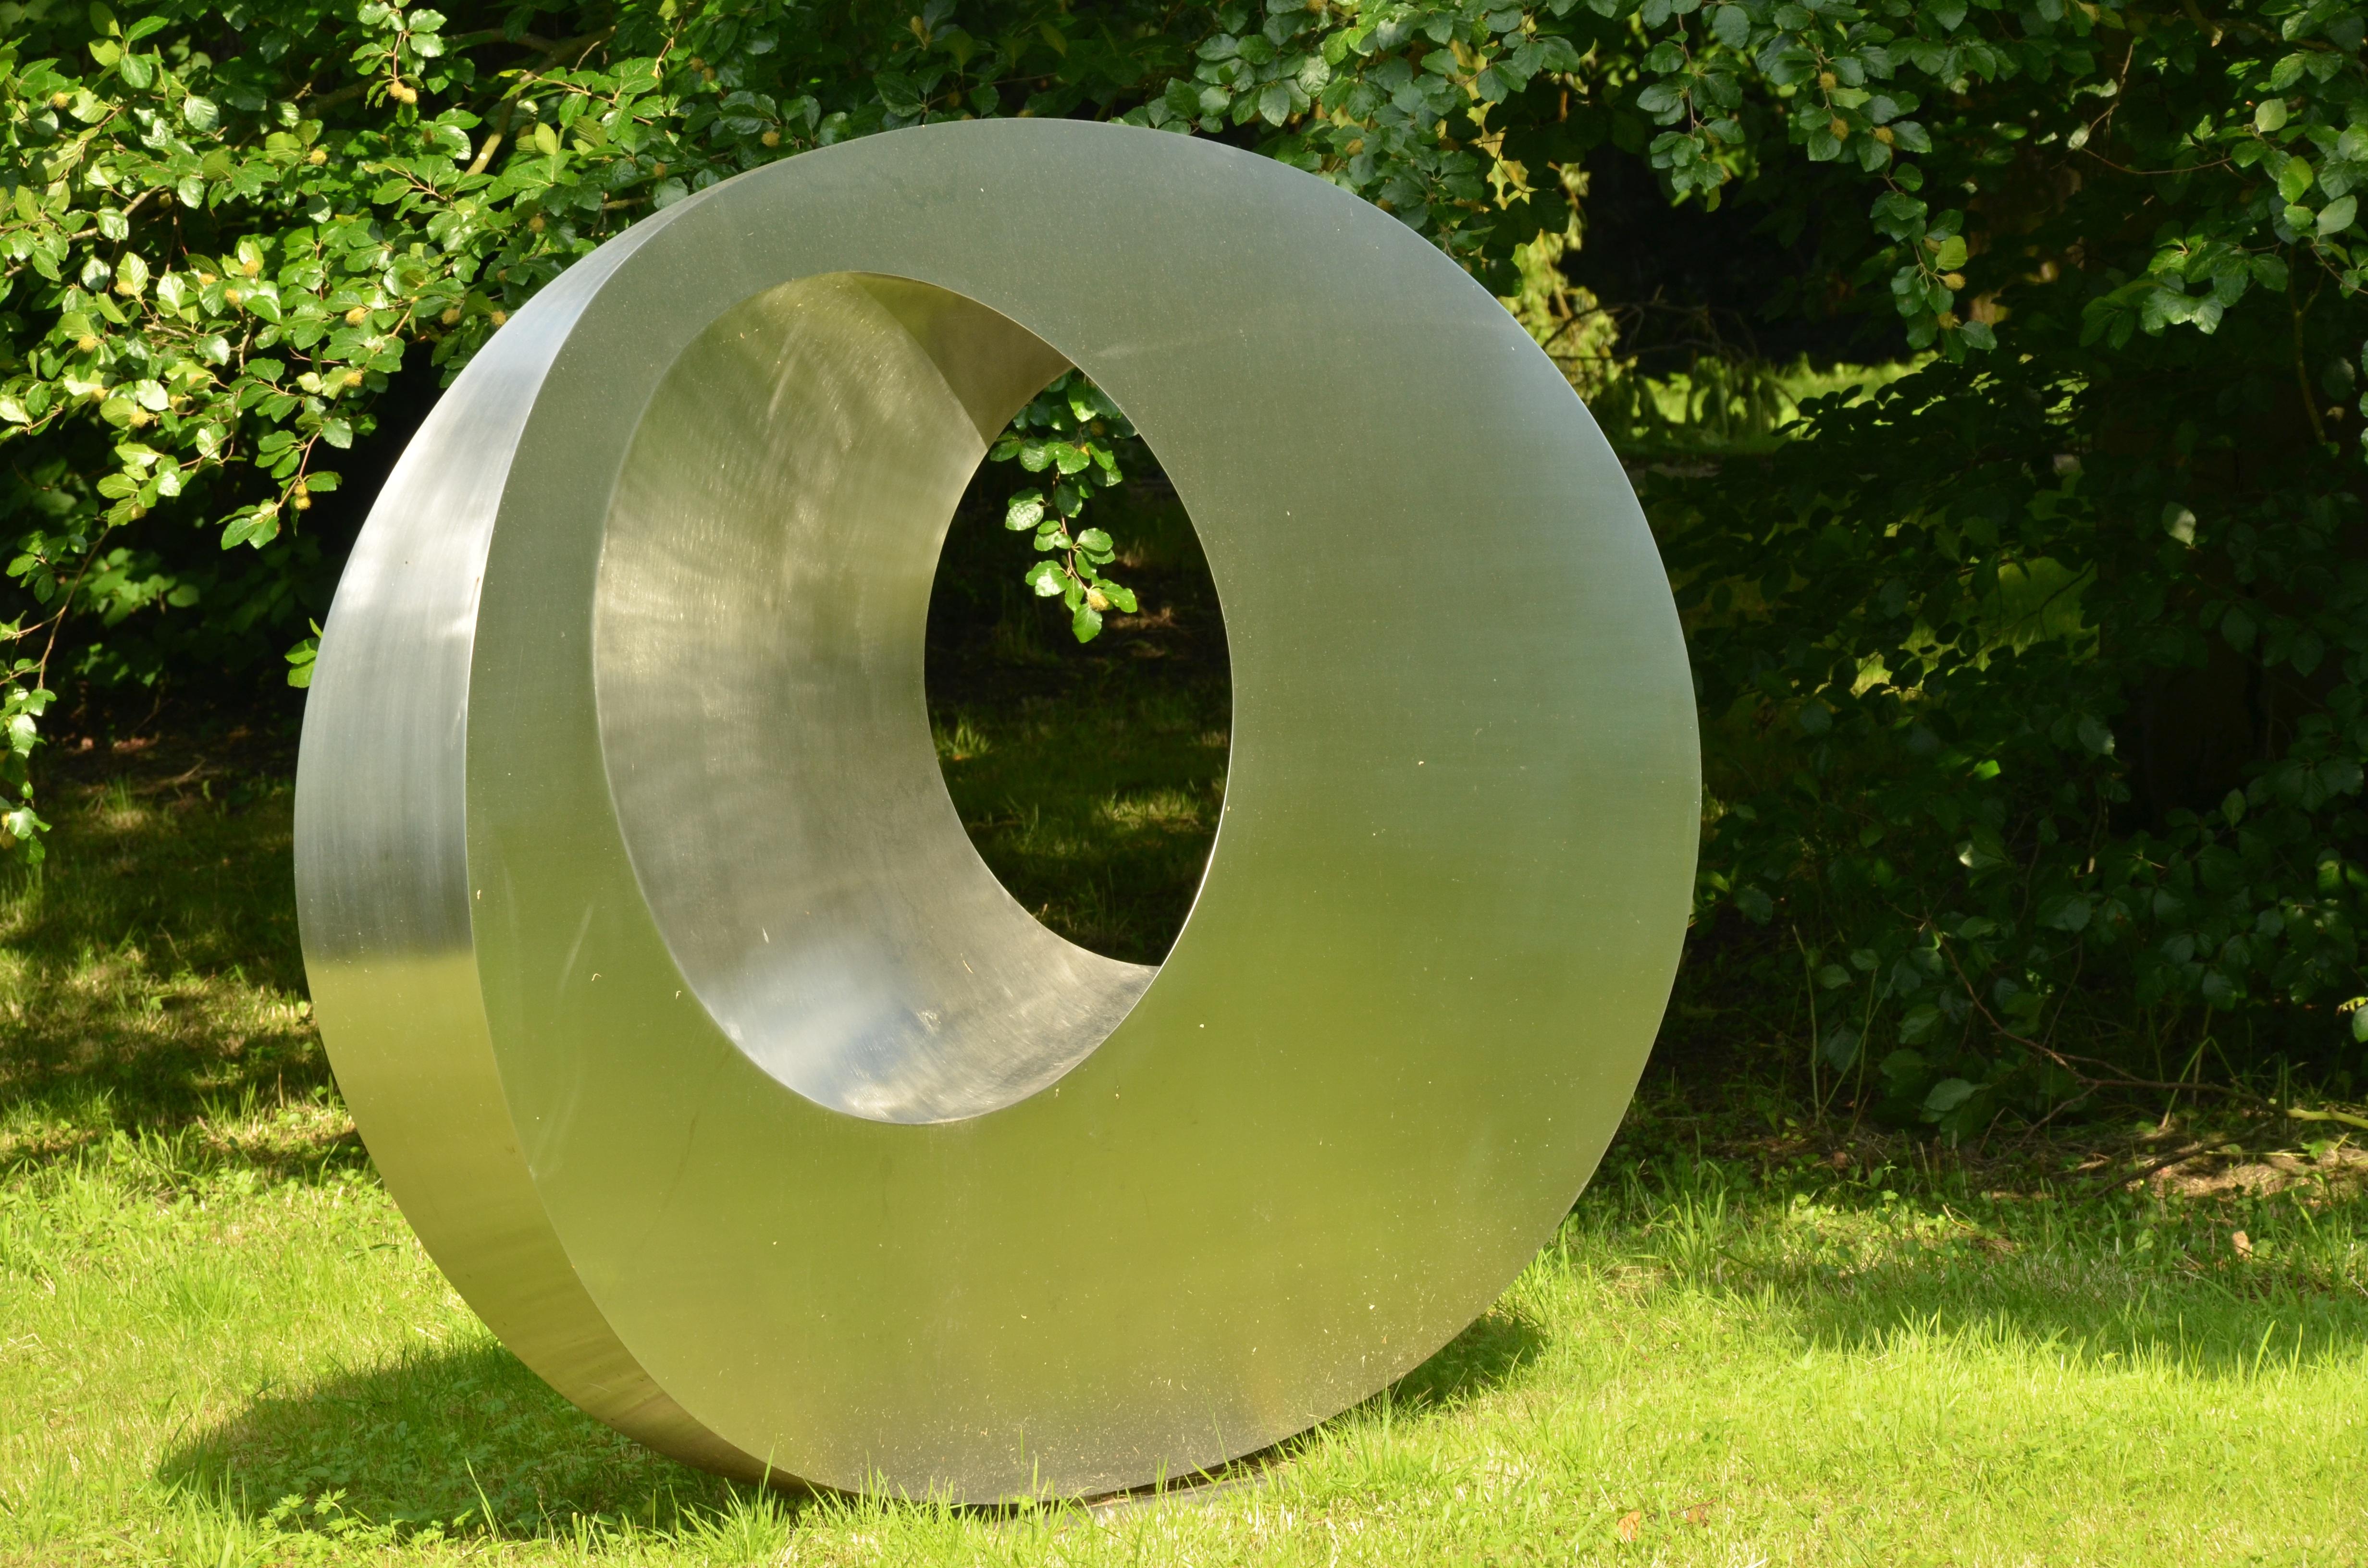 Free Images : grass, lawn, wheel, green, metal, circle, sculpture ...